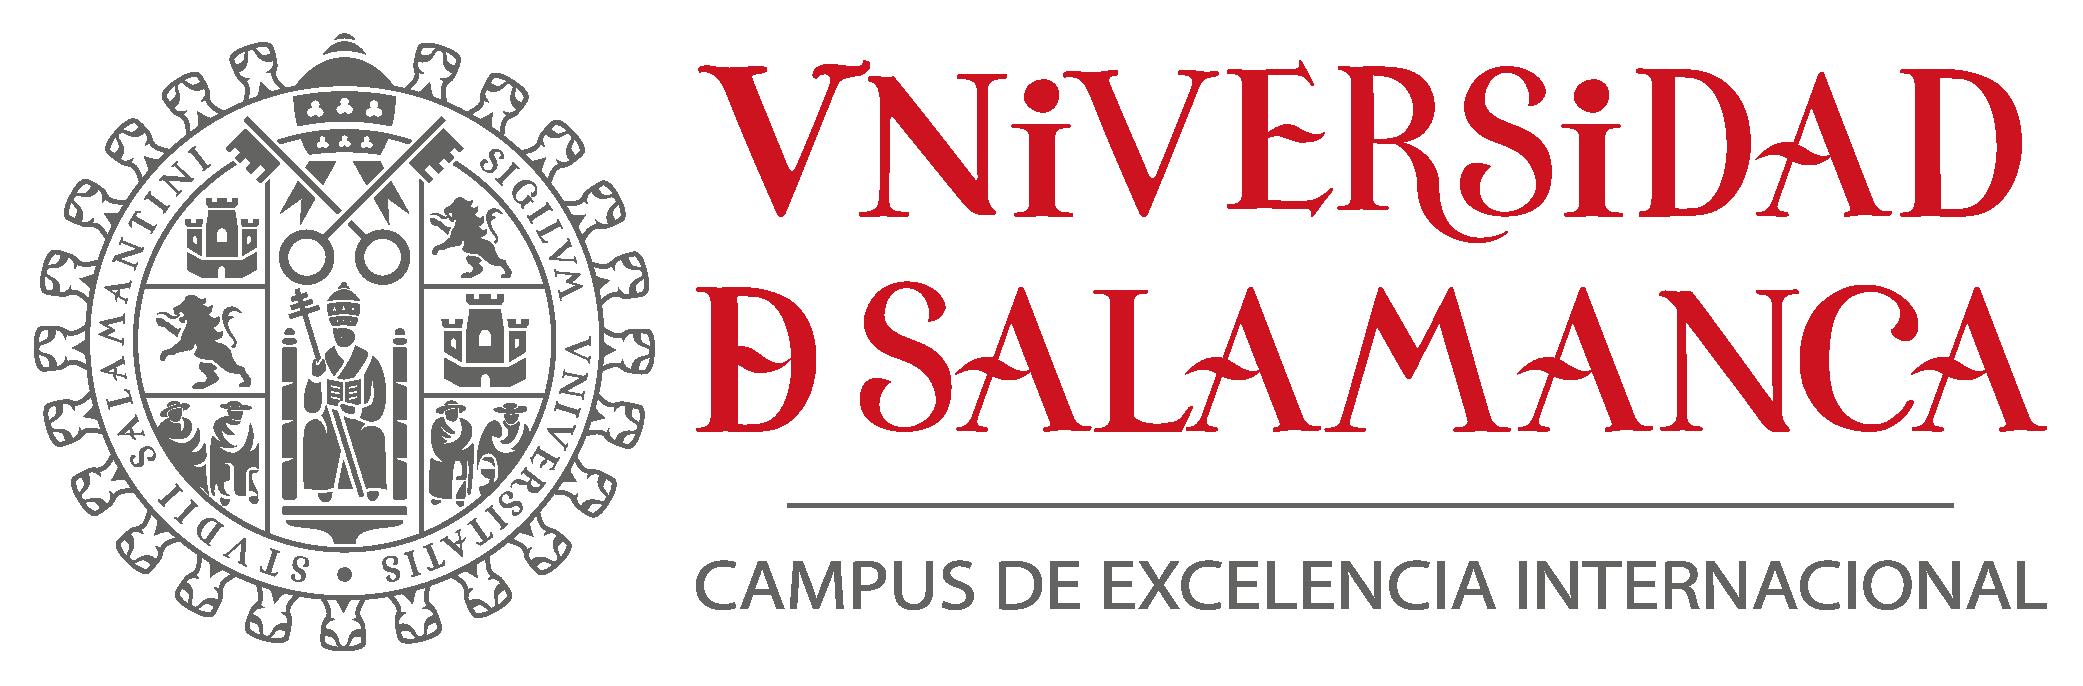 Biblioteca de la Universidad de Salamanca